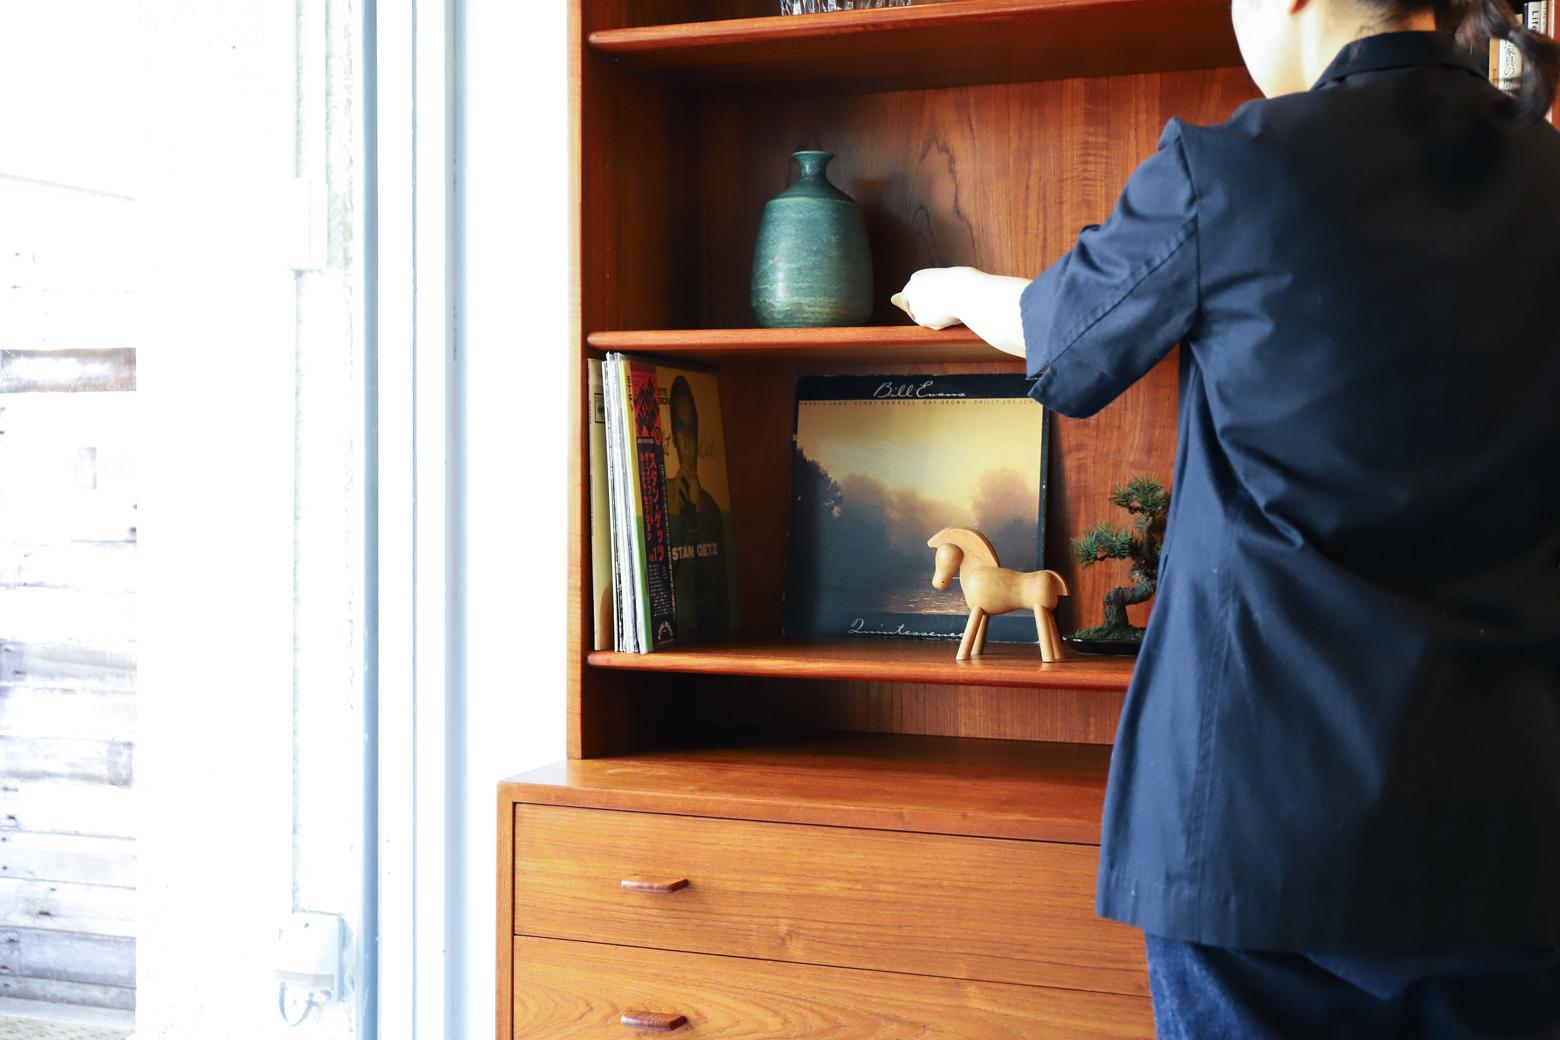 Hans J.Wegner RY MØBLER MODEL RY-5 & RY-17 Bookcase/ハンス・J・ウェグナー ブックケース シェルフ 本棚 デンマーク ヴィンテージ 北欧家具